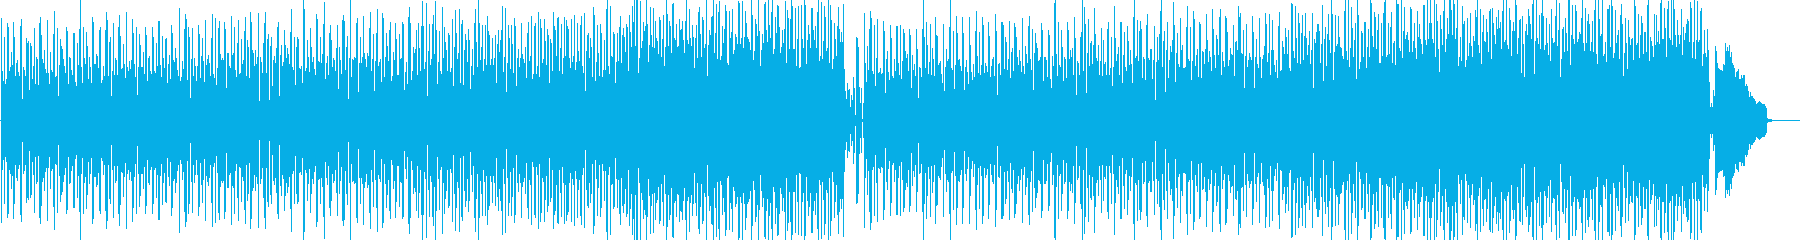 Lo-Fiビートファンキーなヒップホップの再生済みの波形